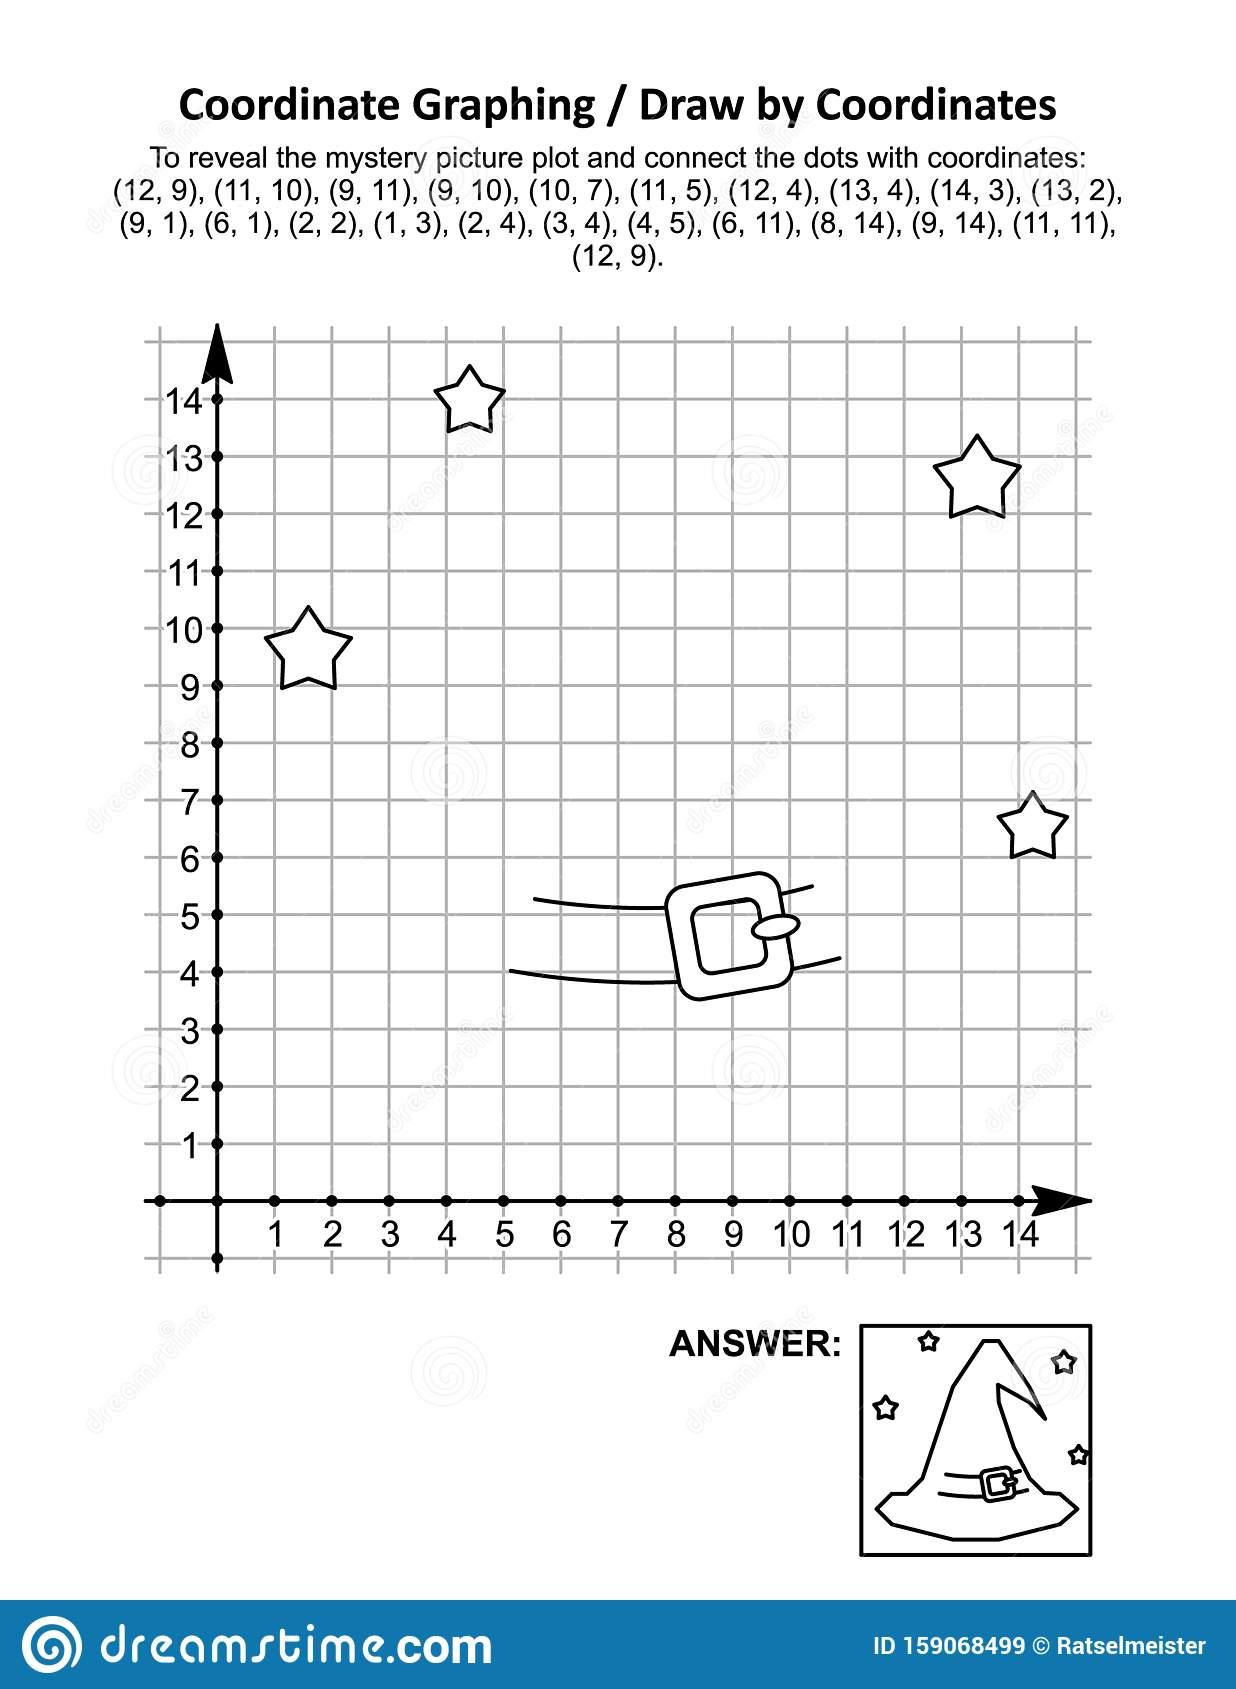 Coordinate Graphing, Or Drawcoordinates, Math Worksheet